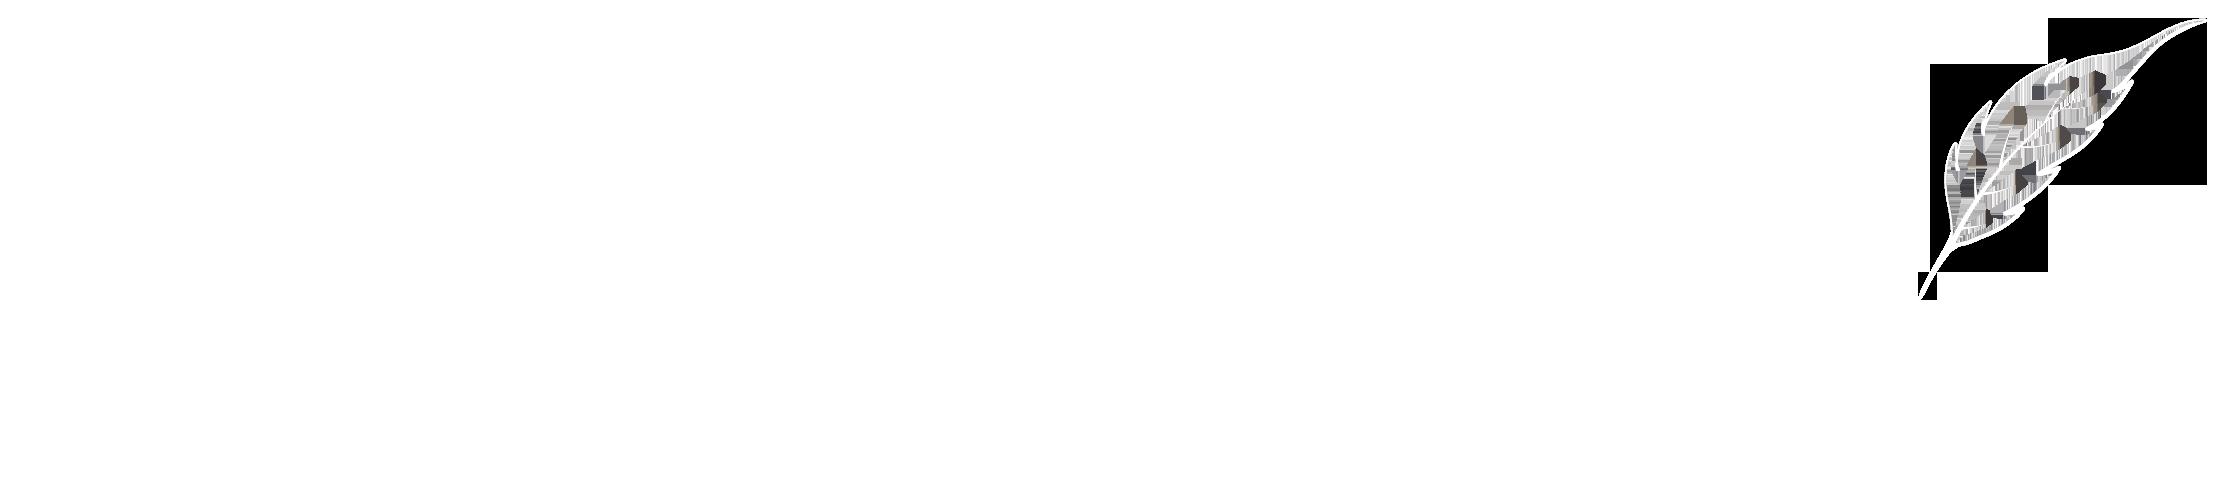 Joshua Sandefur